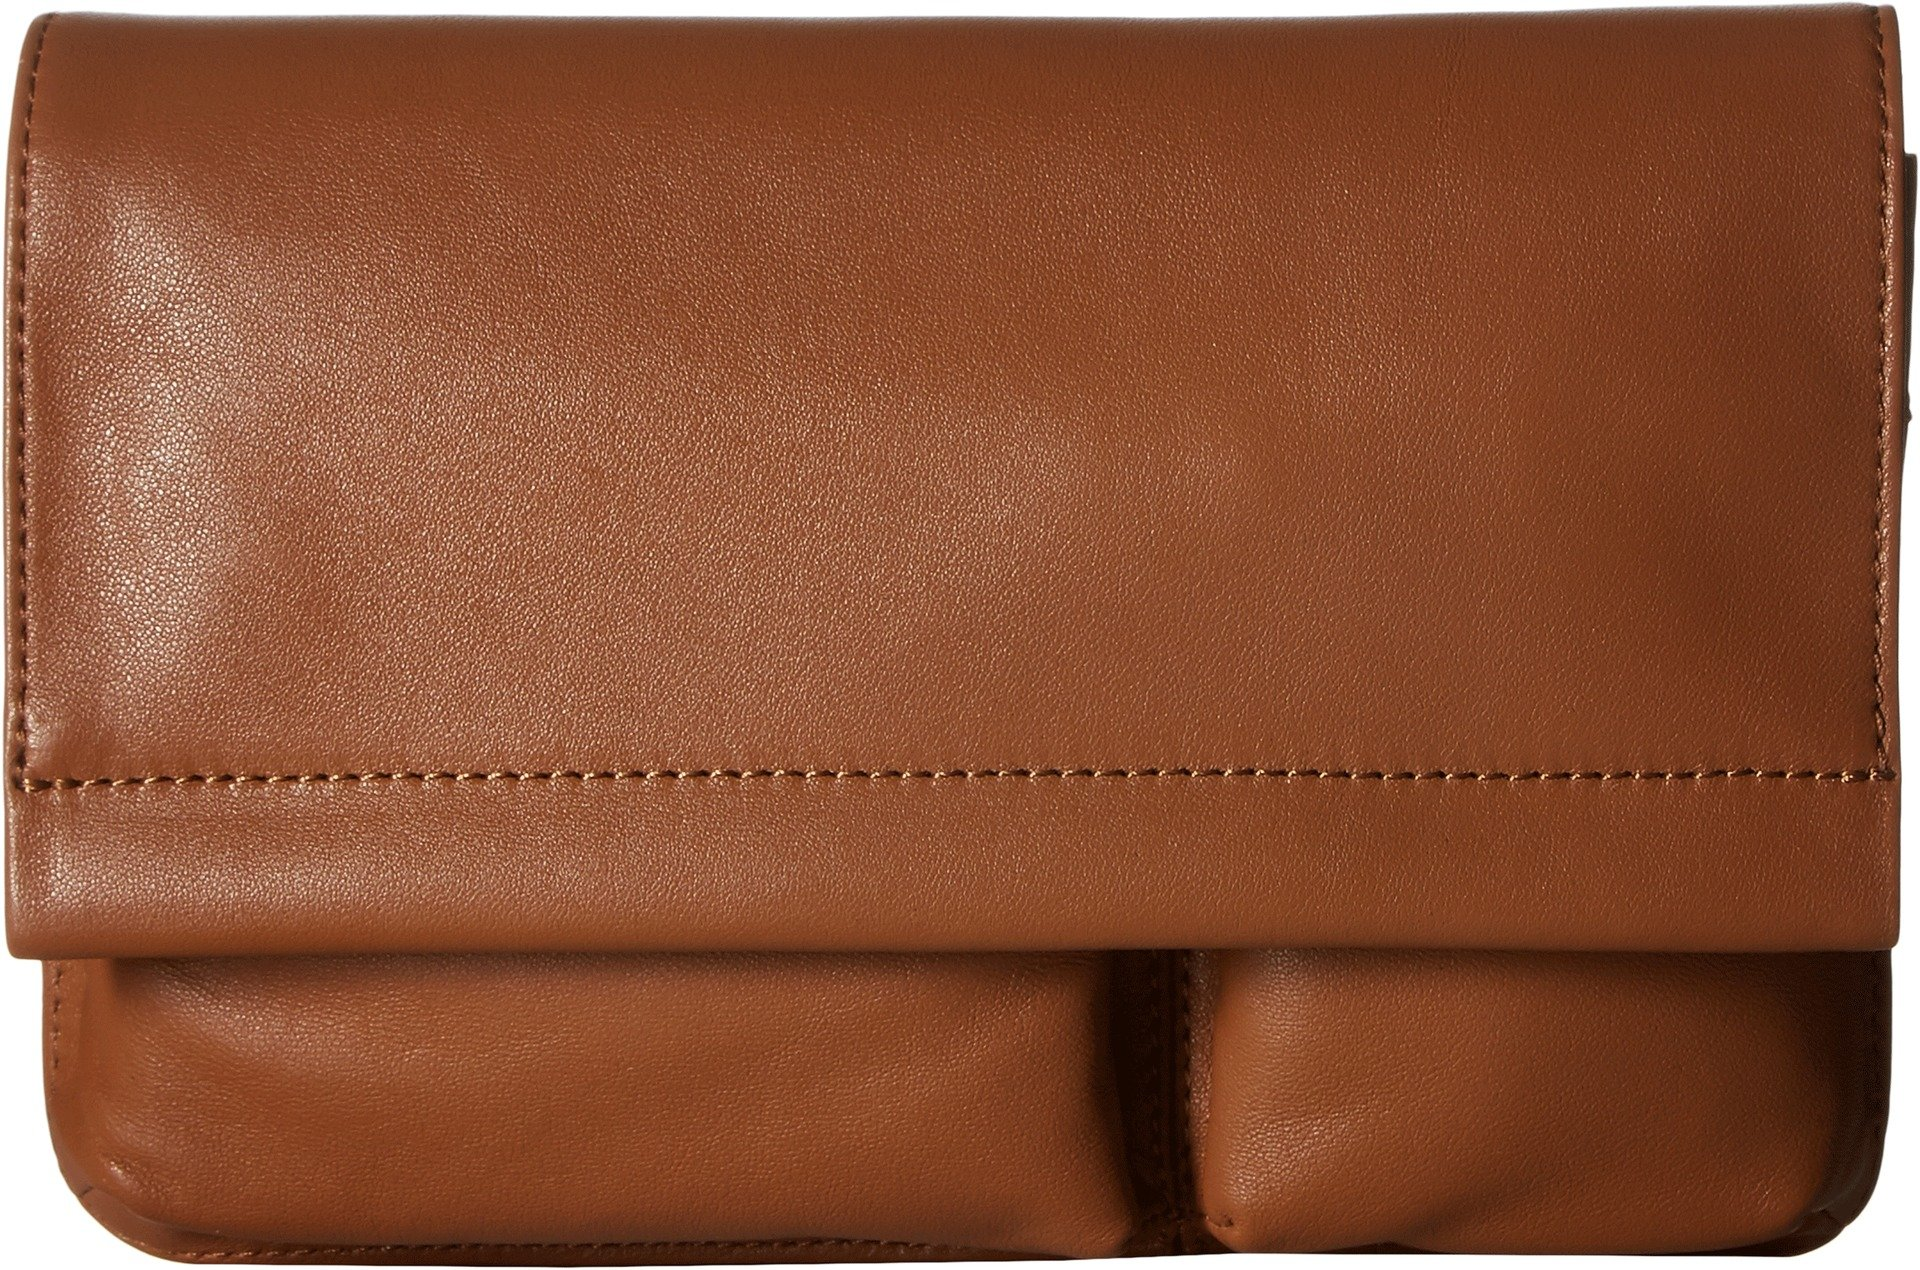 Kooba Women's Belize Convertible Belt Bag Honey One Size